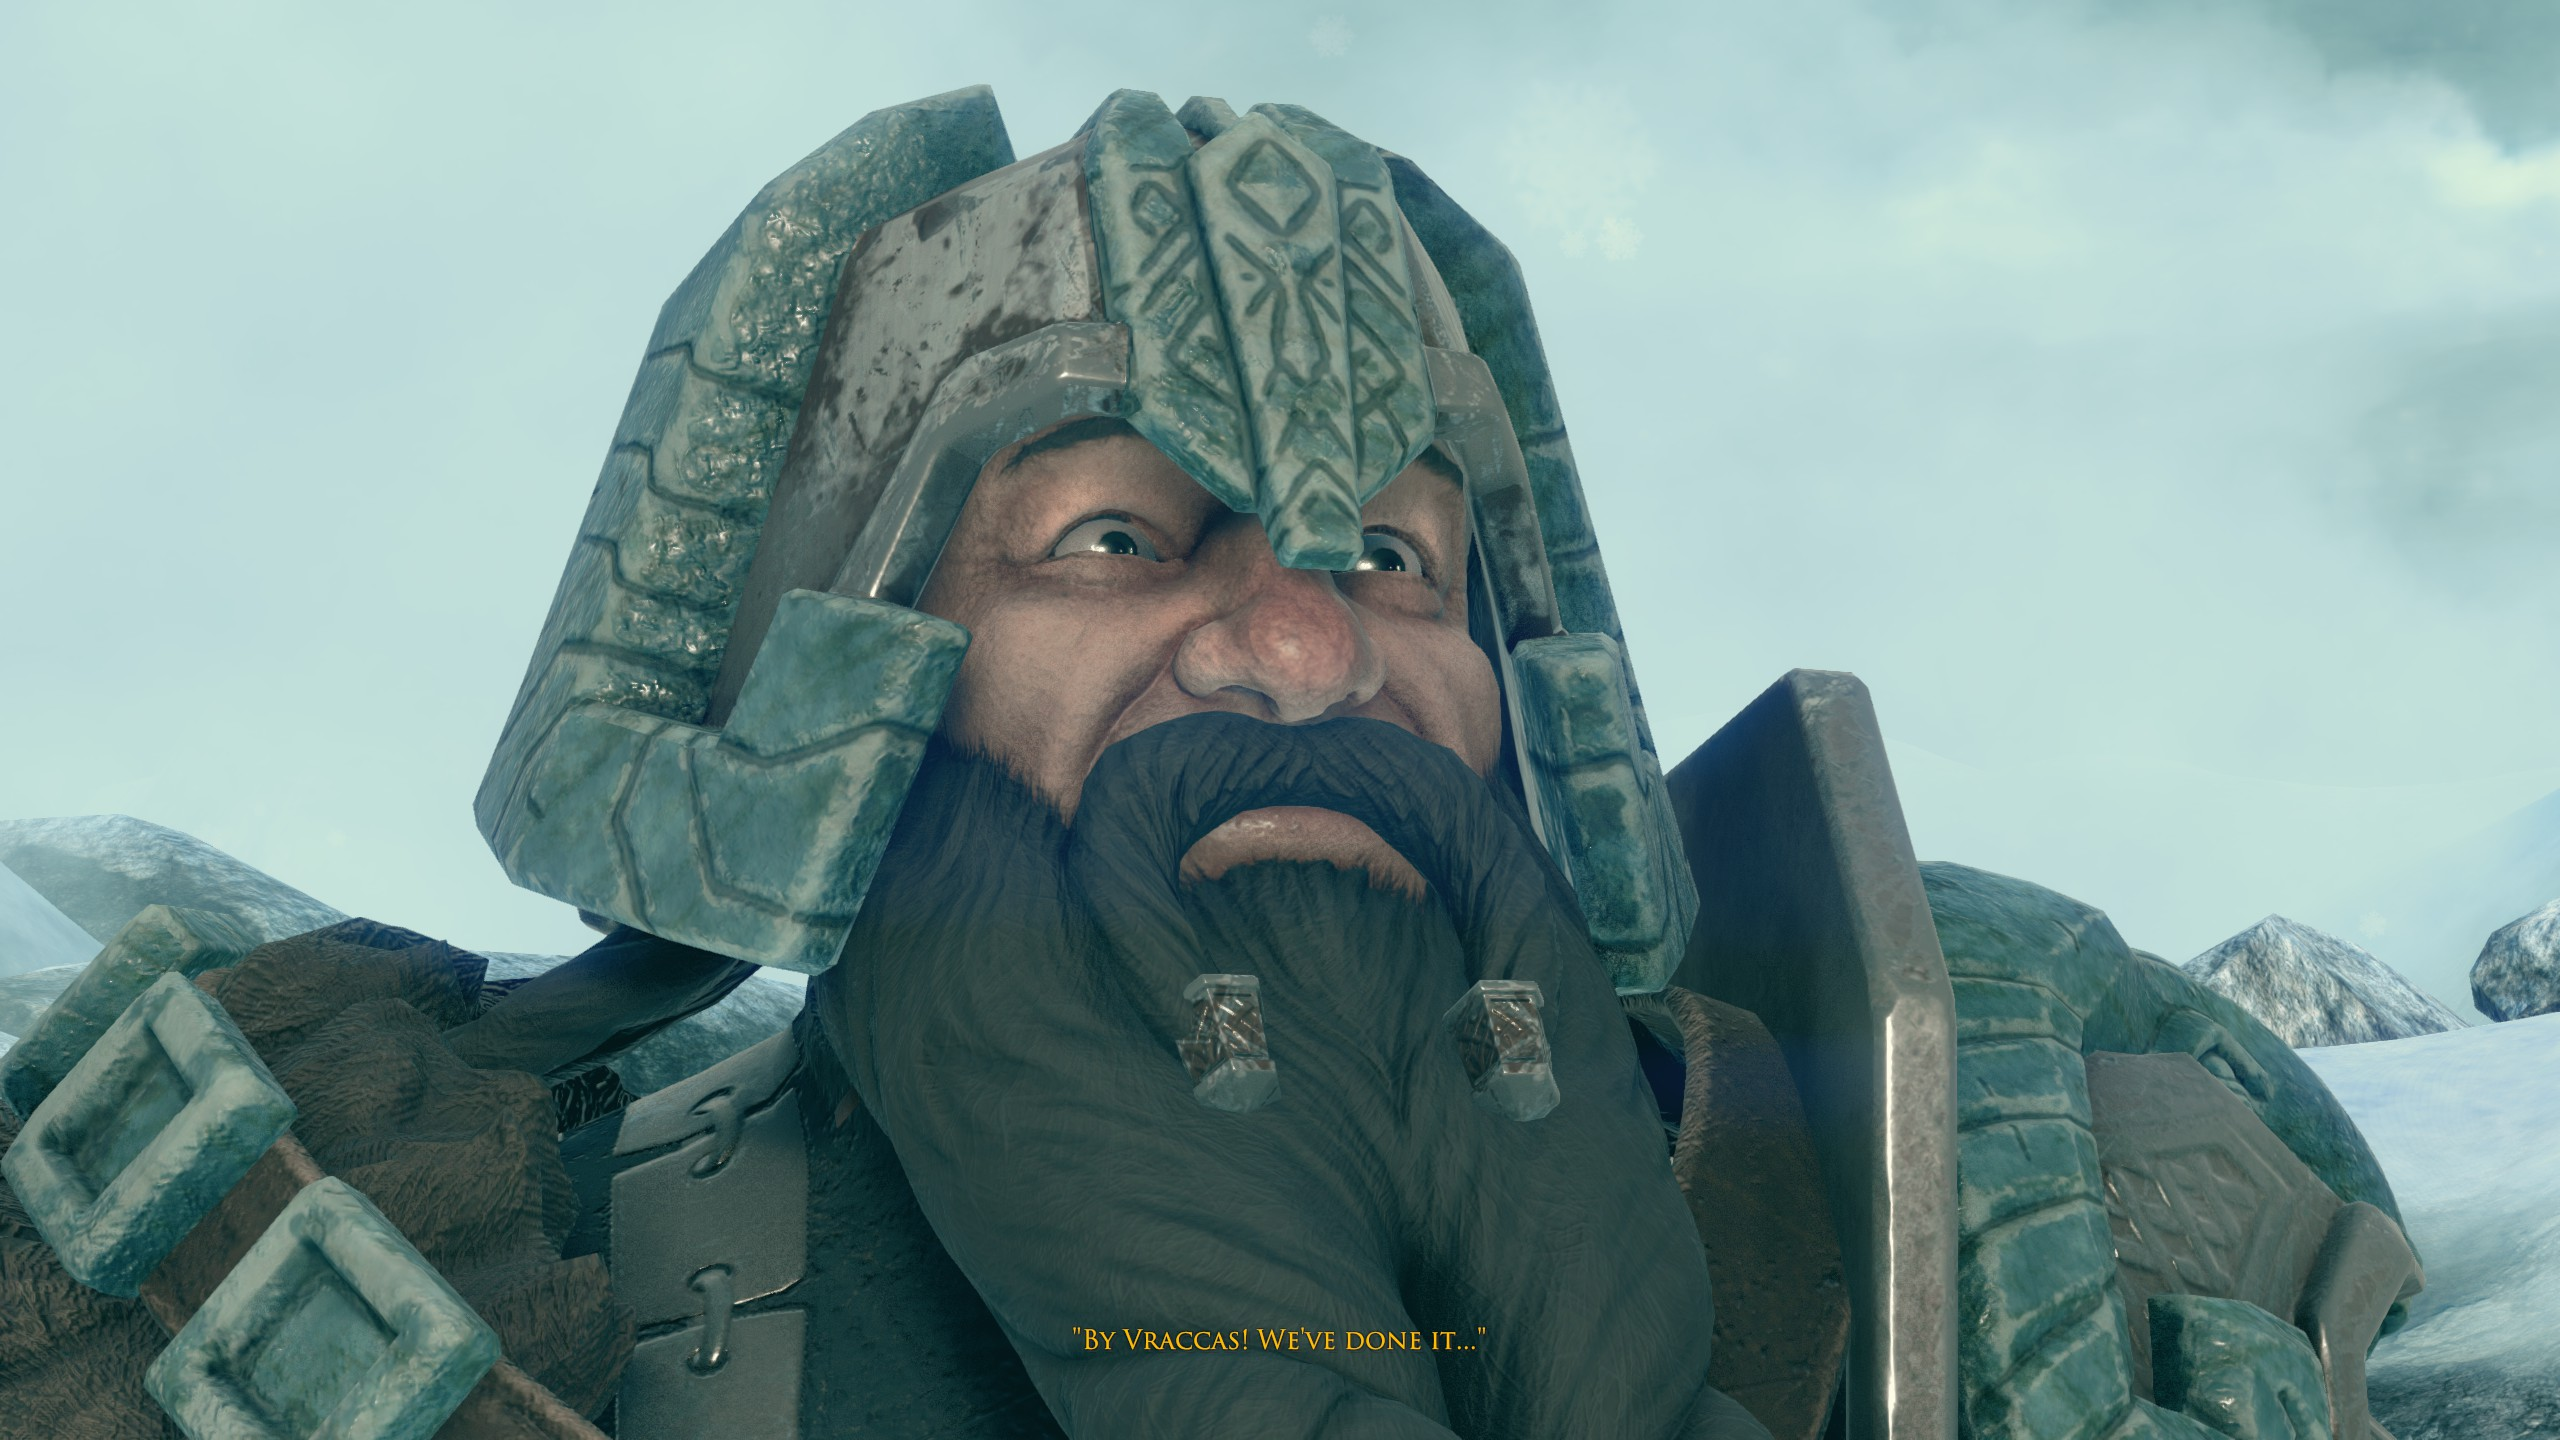 Dwarves Chracter